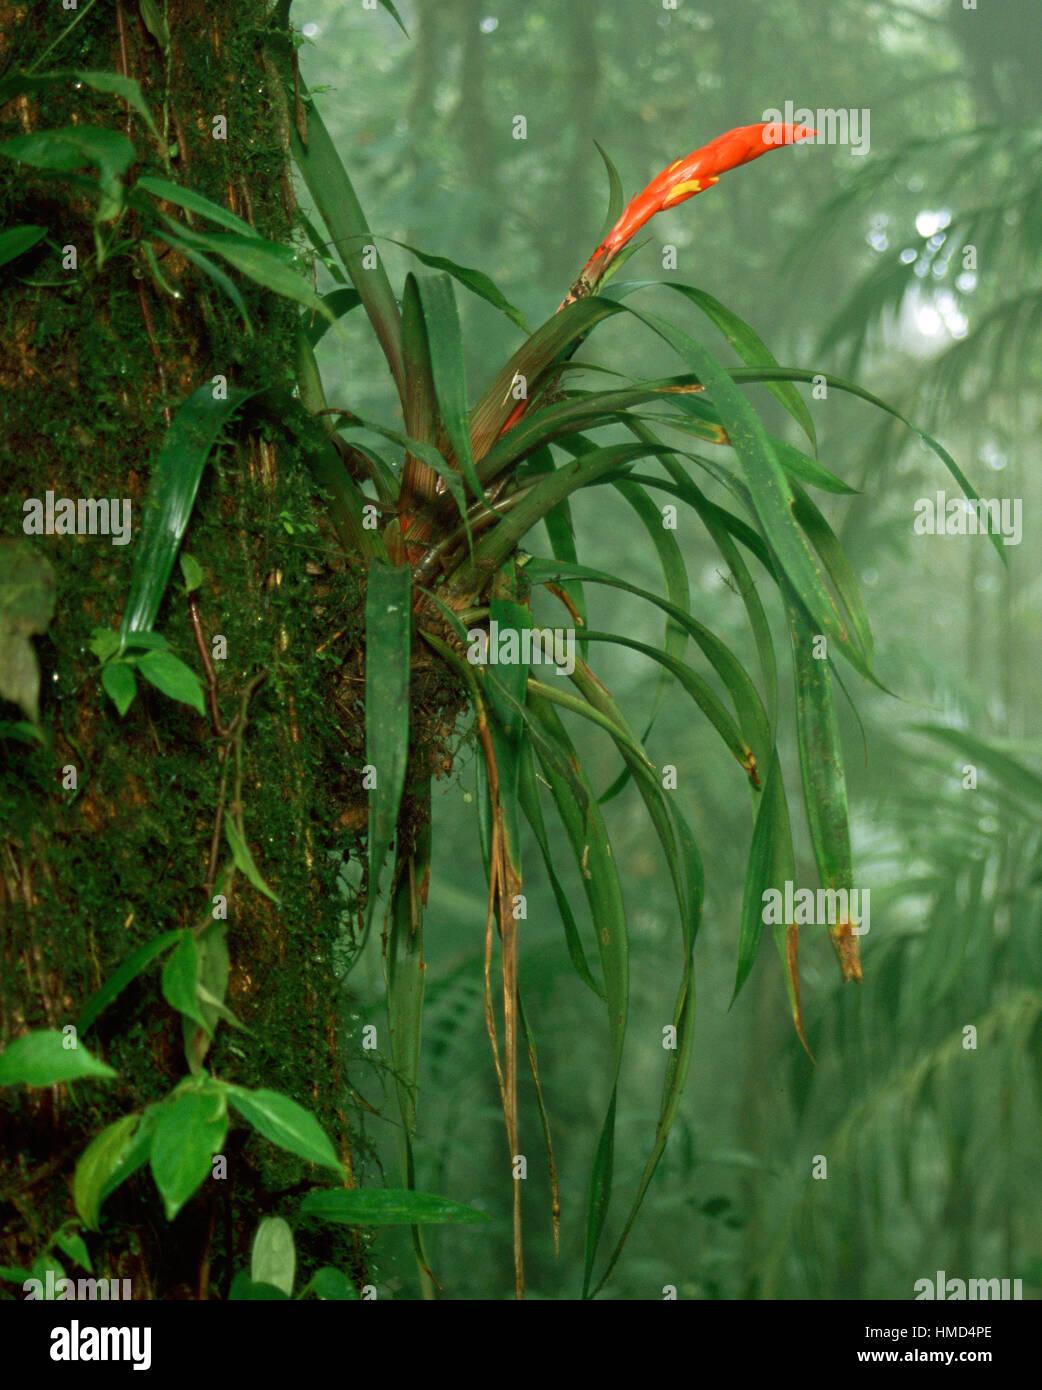 Bromeliad (Guzmania nicaraguensis) in Monteverde Cloud Forest Preserve, Costa Rica - Stock Image